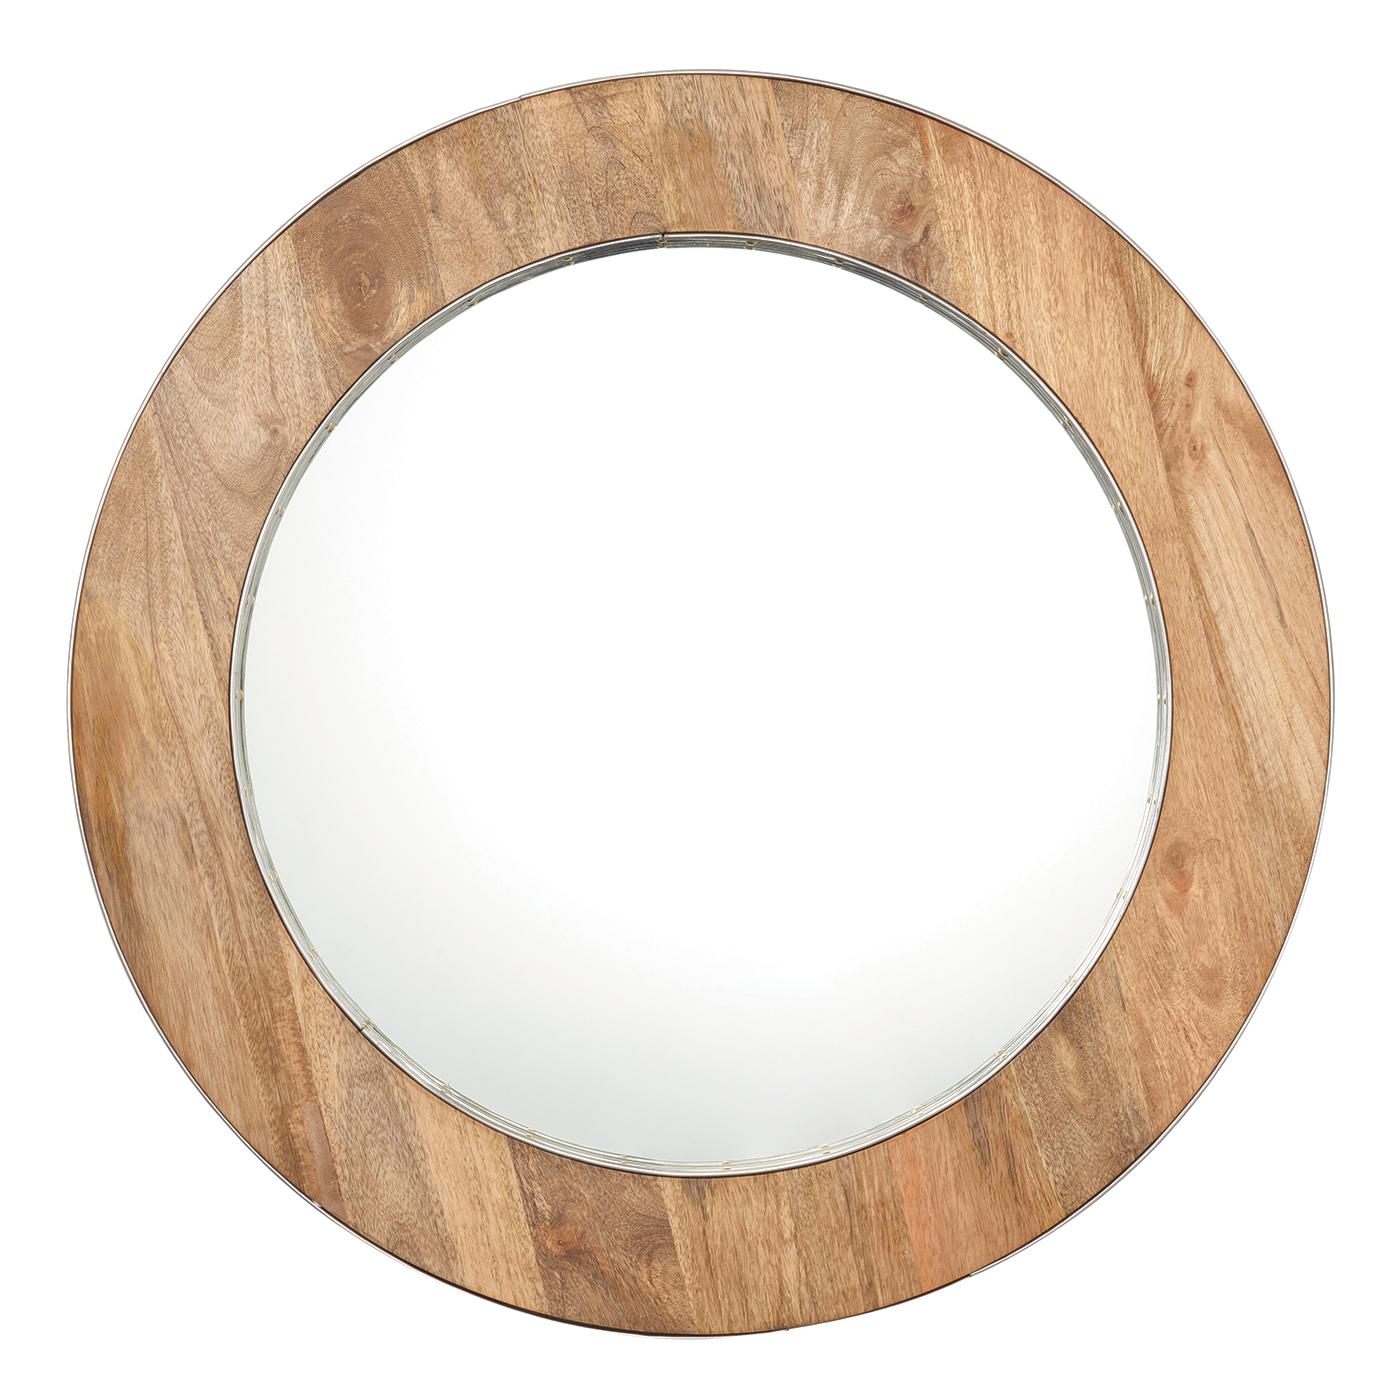 Endon torrington miroir rond bois naturel diam tre 820mm for Gros miroir rond